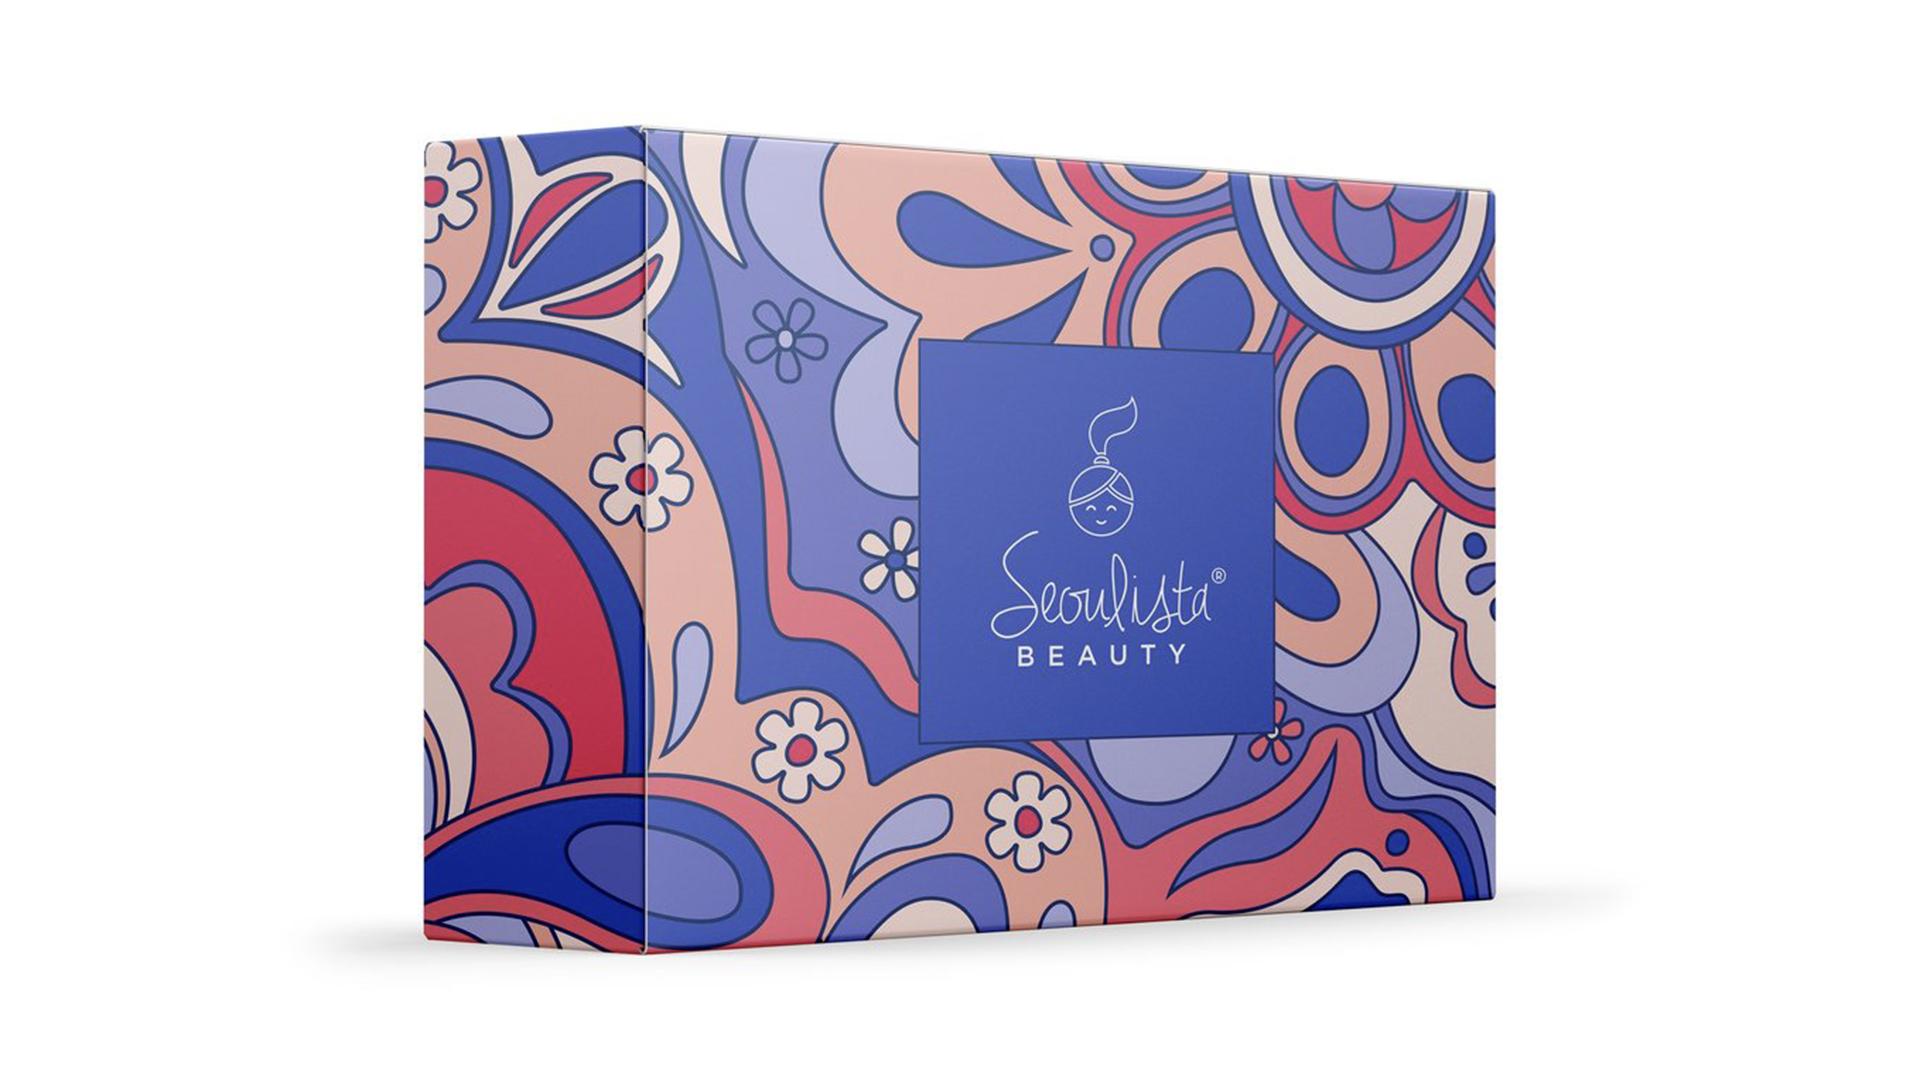 Galentine's Day Gift Seoulista 'The Sunshine Edit' Beauty Kit